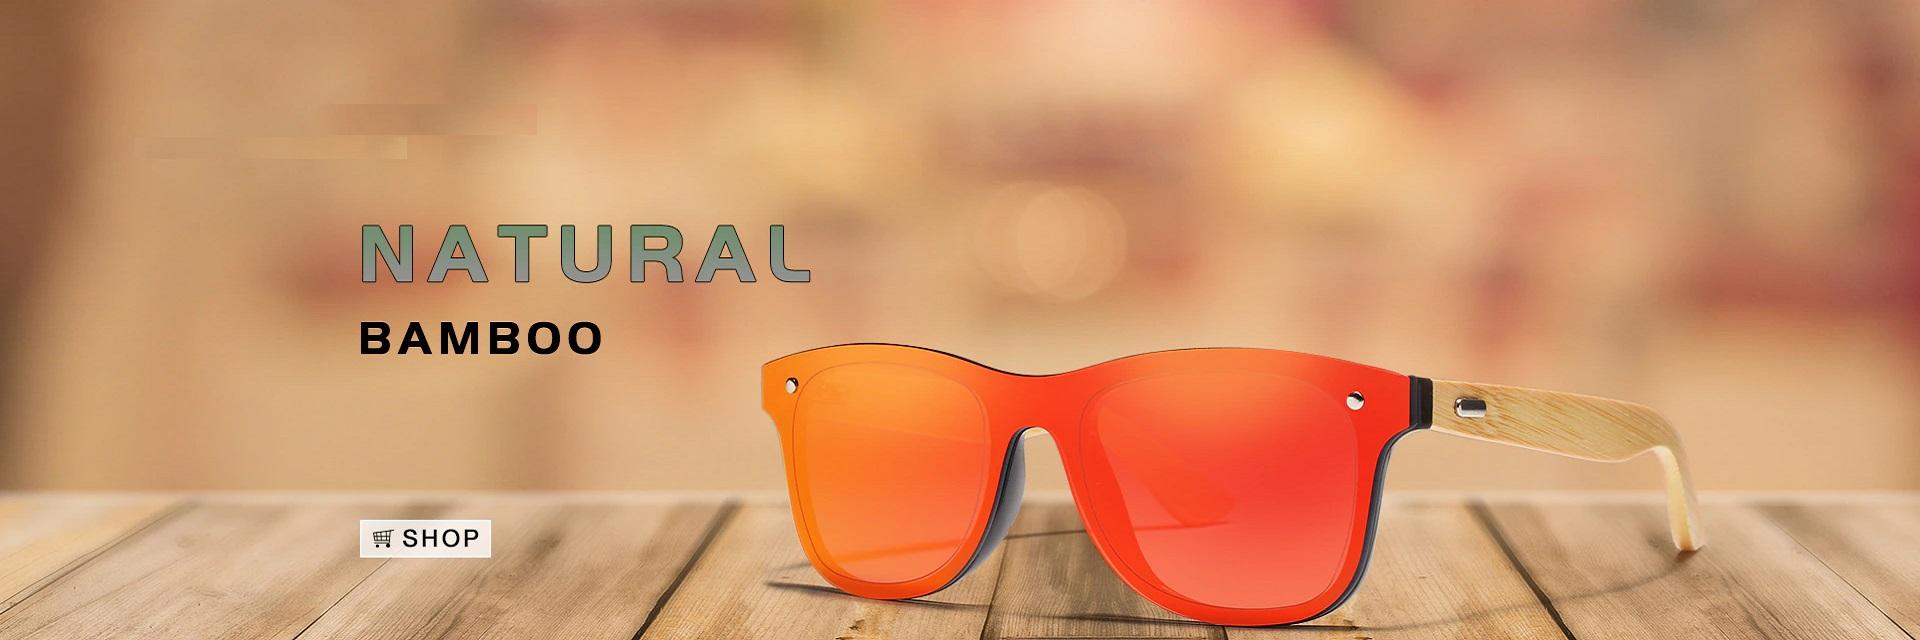 sunglasses-polarized-uv400-natural-bamboo